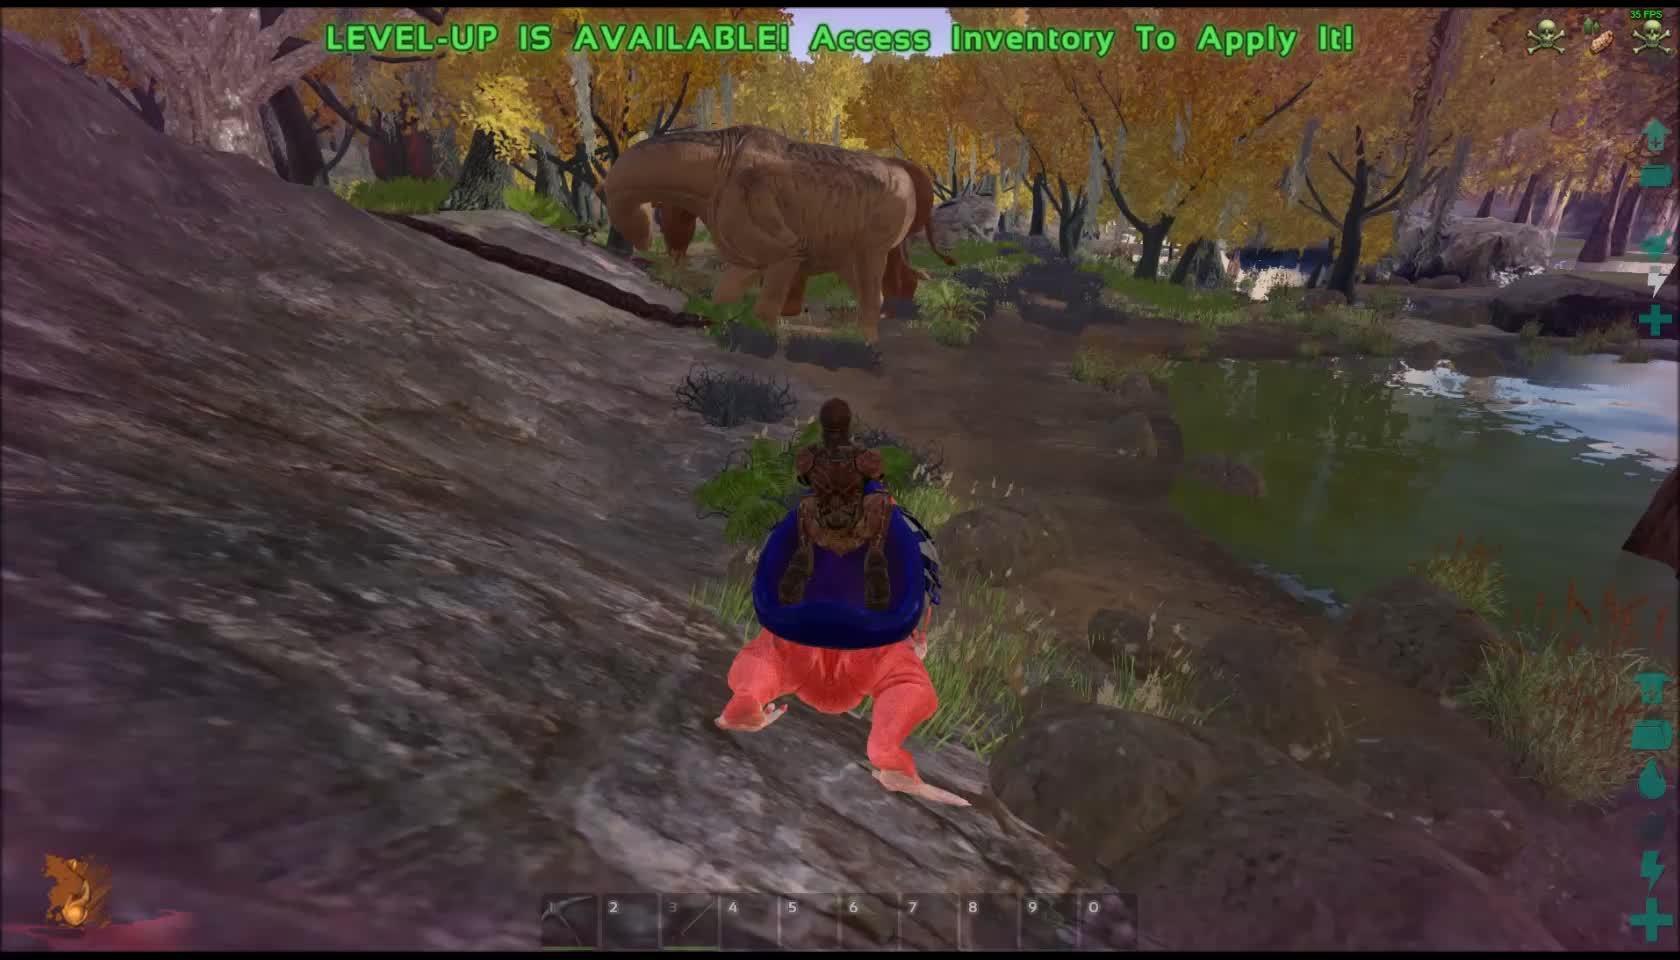 playark, I fucking love the swamp GIFs